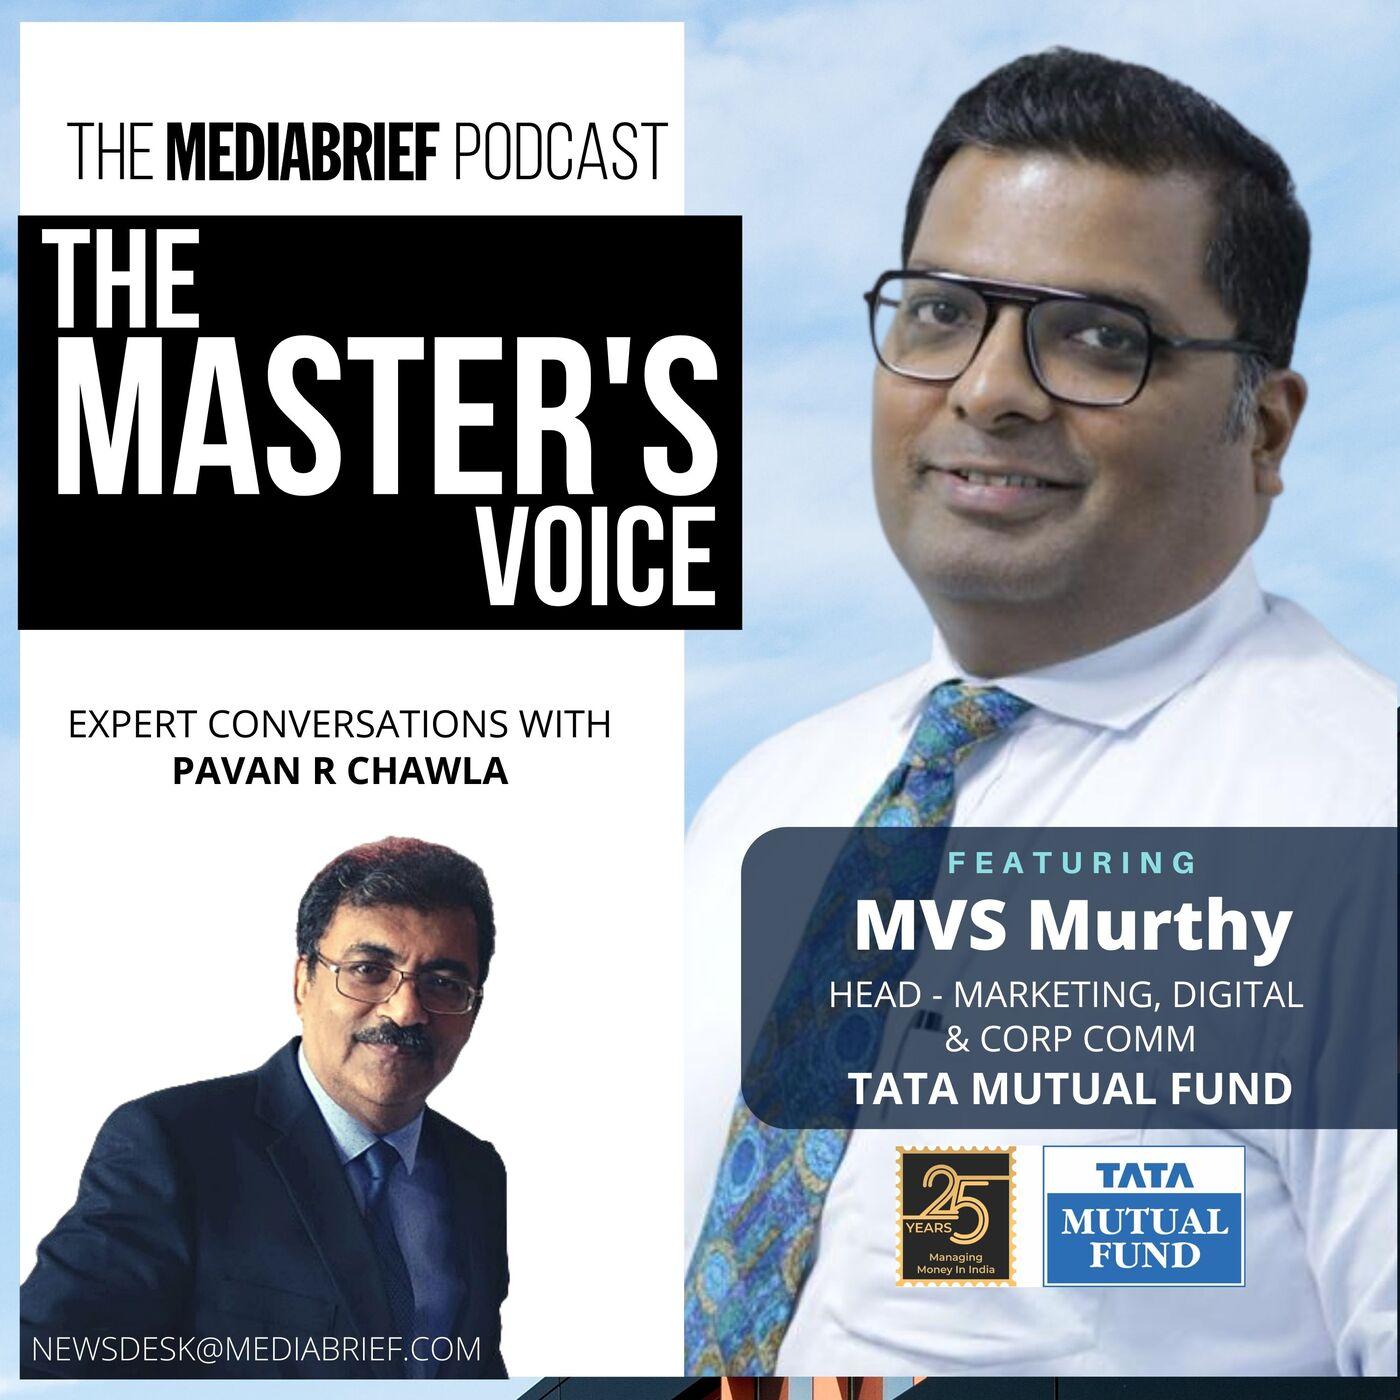 EXCLUSIVE PODCAST - MVS Murthy, Head Marketing, Digital, Corp Comm - Tata Mutual Funds